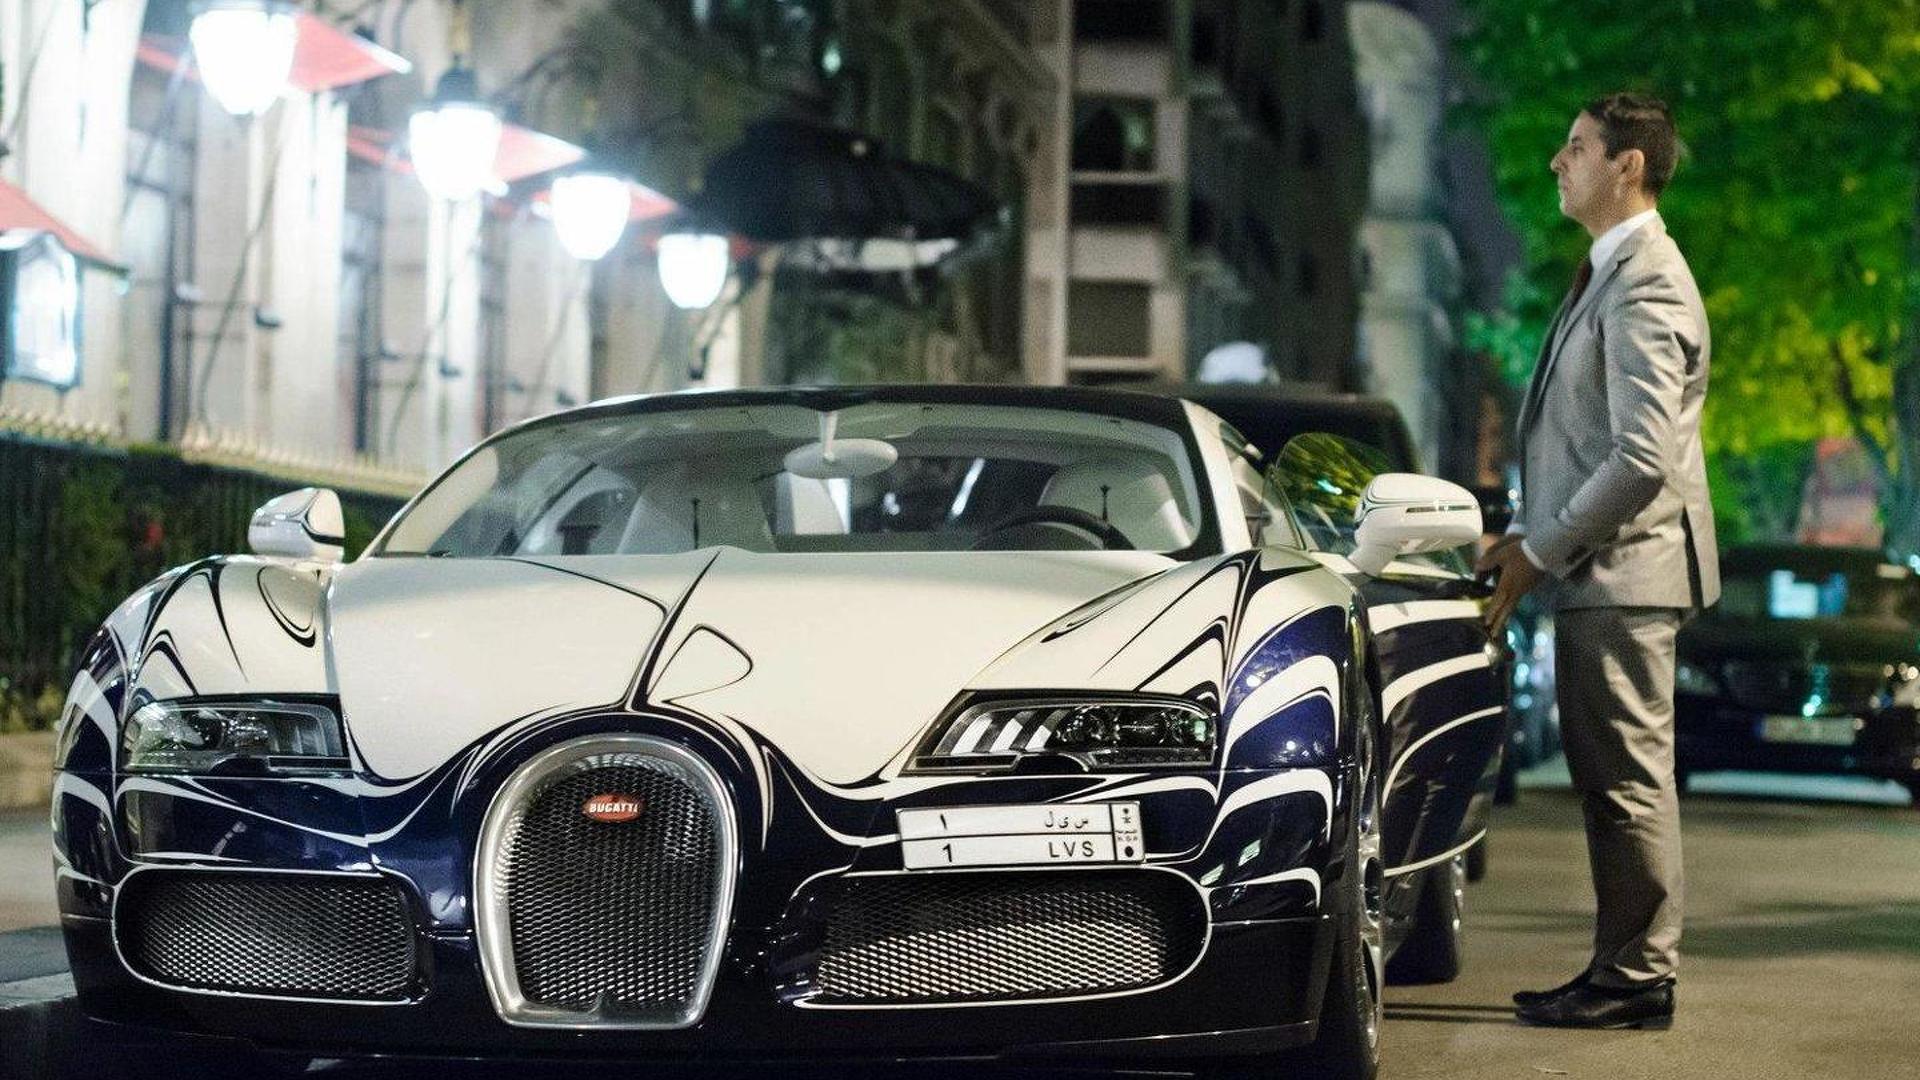 2012-309878-bugatti-veyron-l-or-blanc-on-the-streets-of-paris-17-04-20121 Wonderful Bugatti Veyron On Road Price Cars Trend